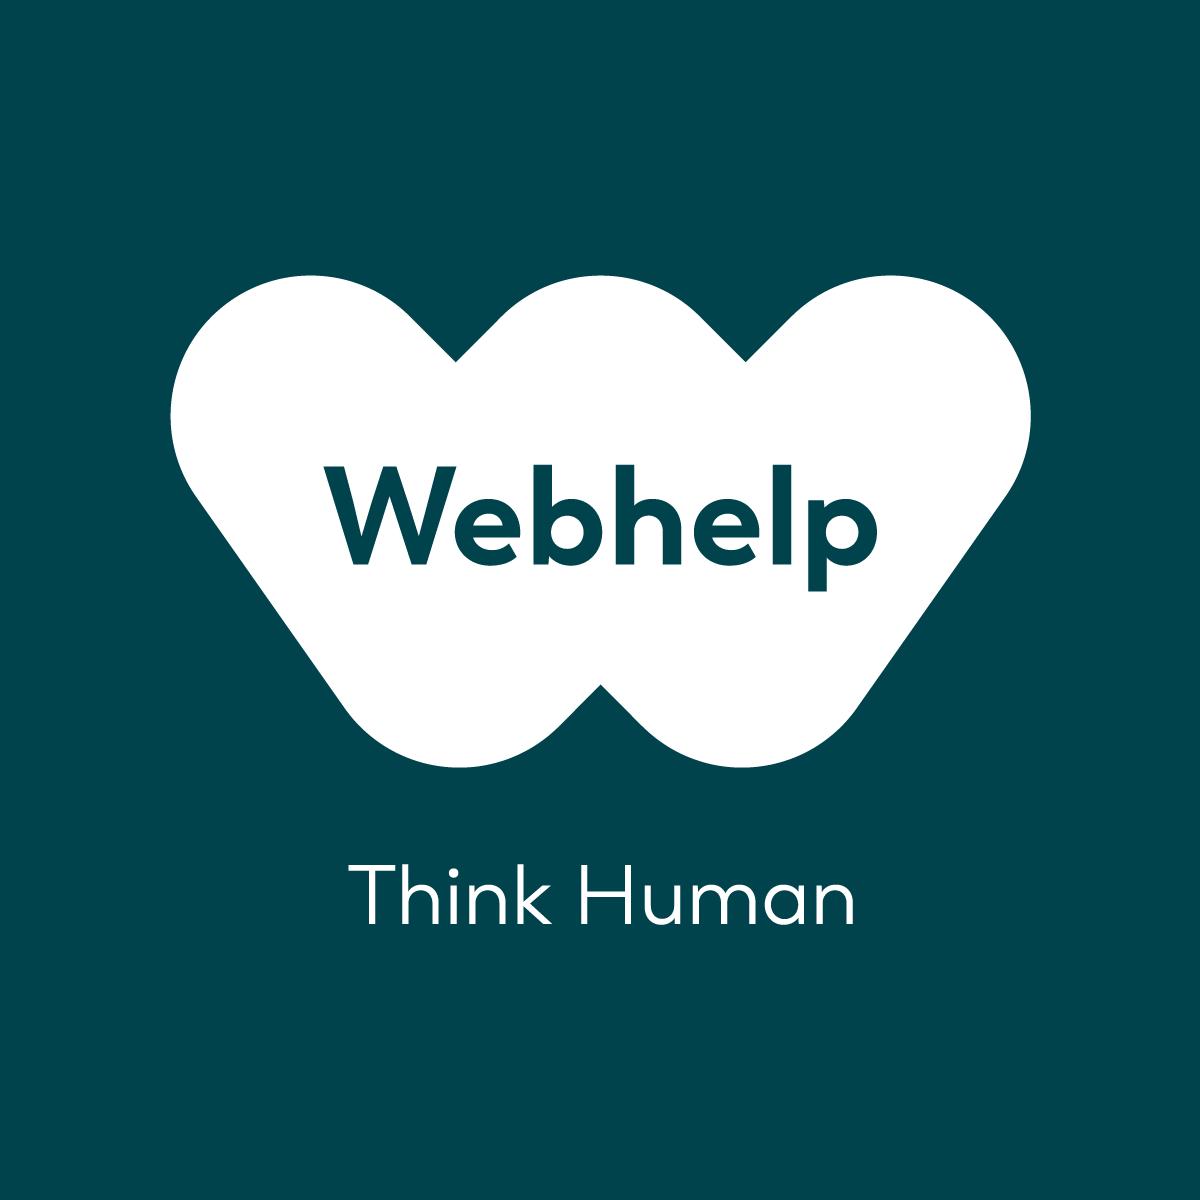 e5095ca9-webhelp-logo.png